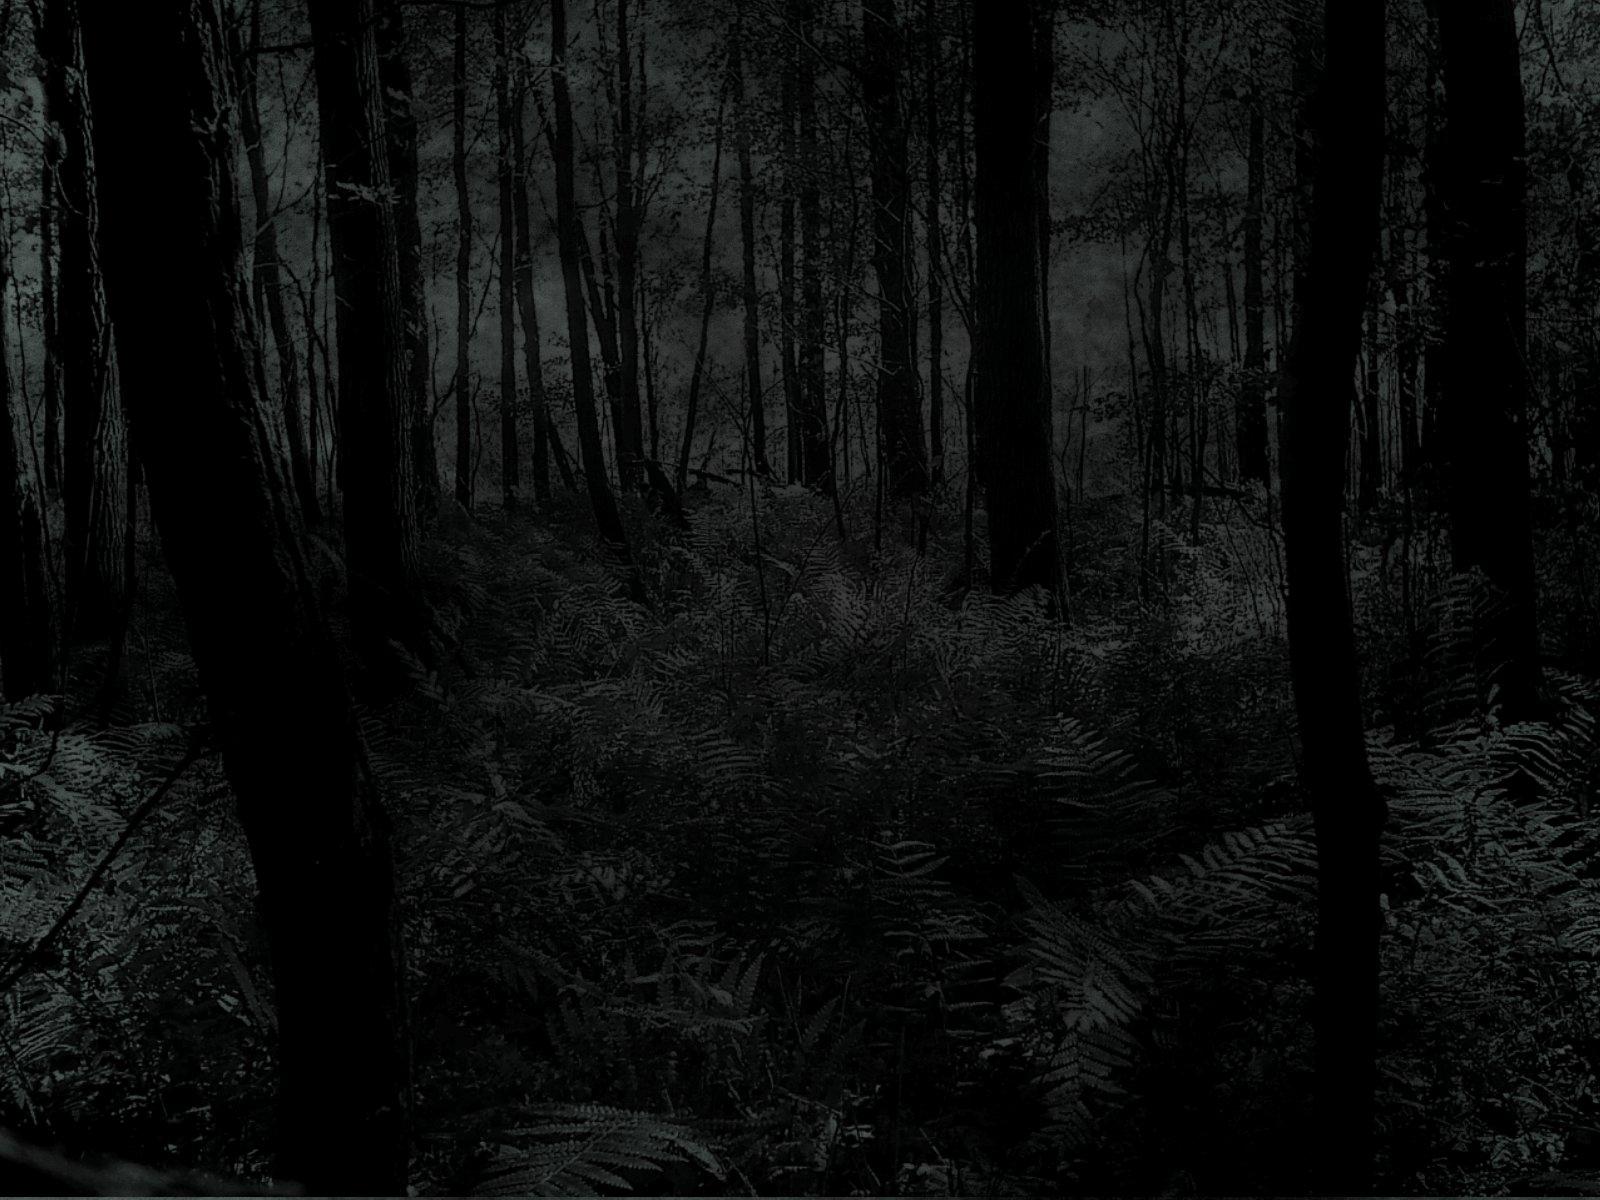 Creepy trees dark forests woods wallpaper | 1600x1200 | 232757 ...